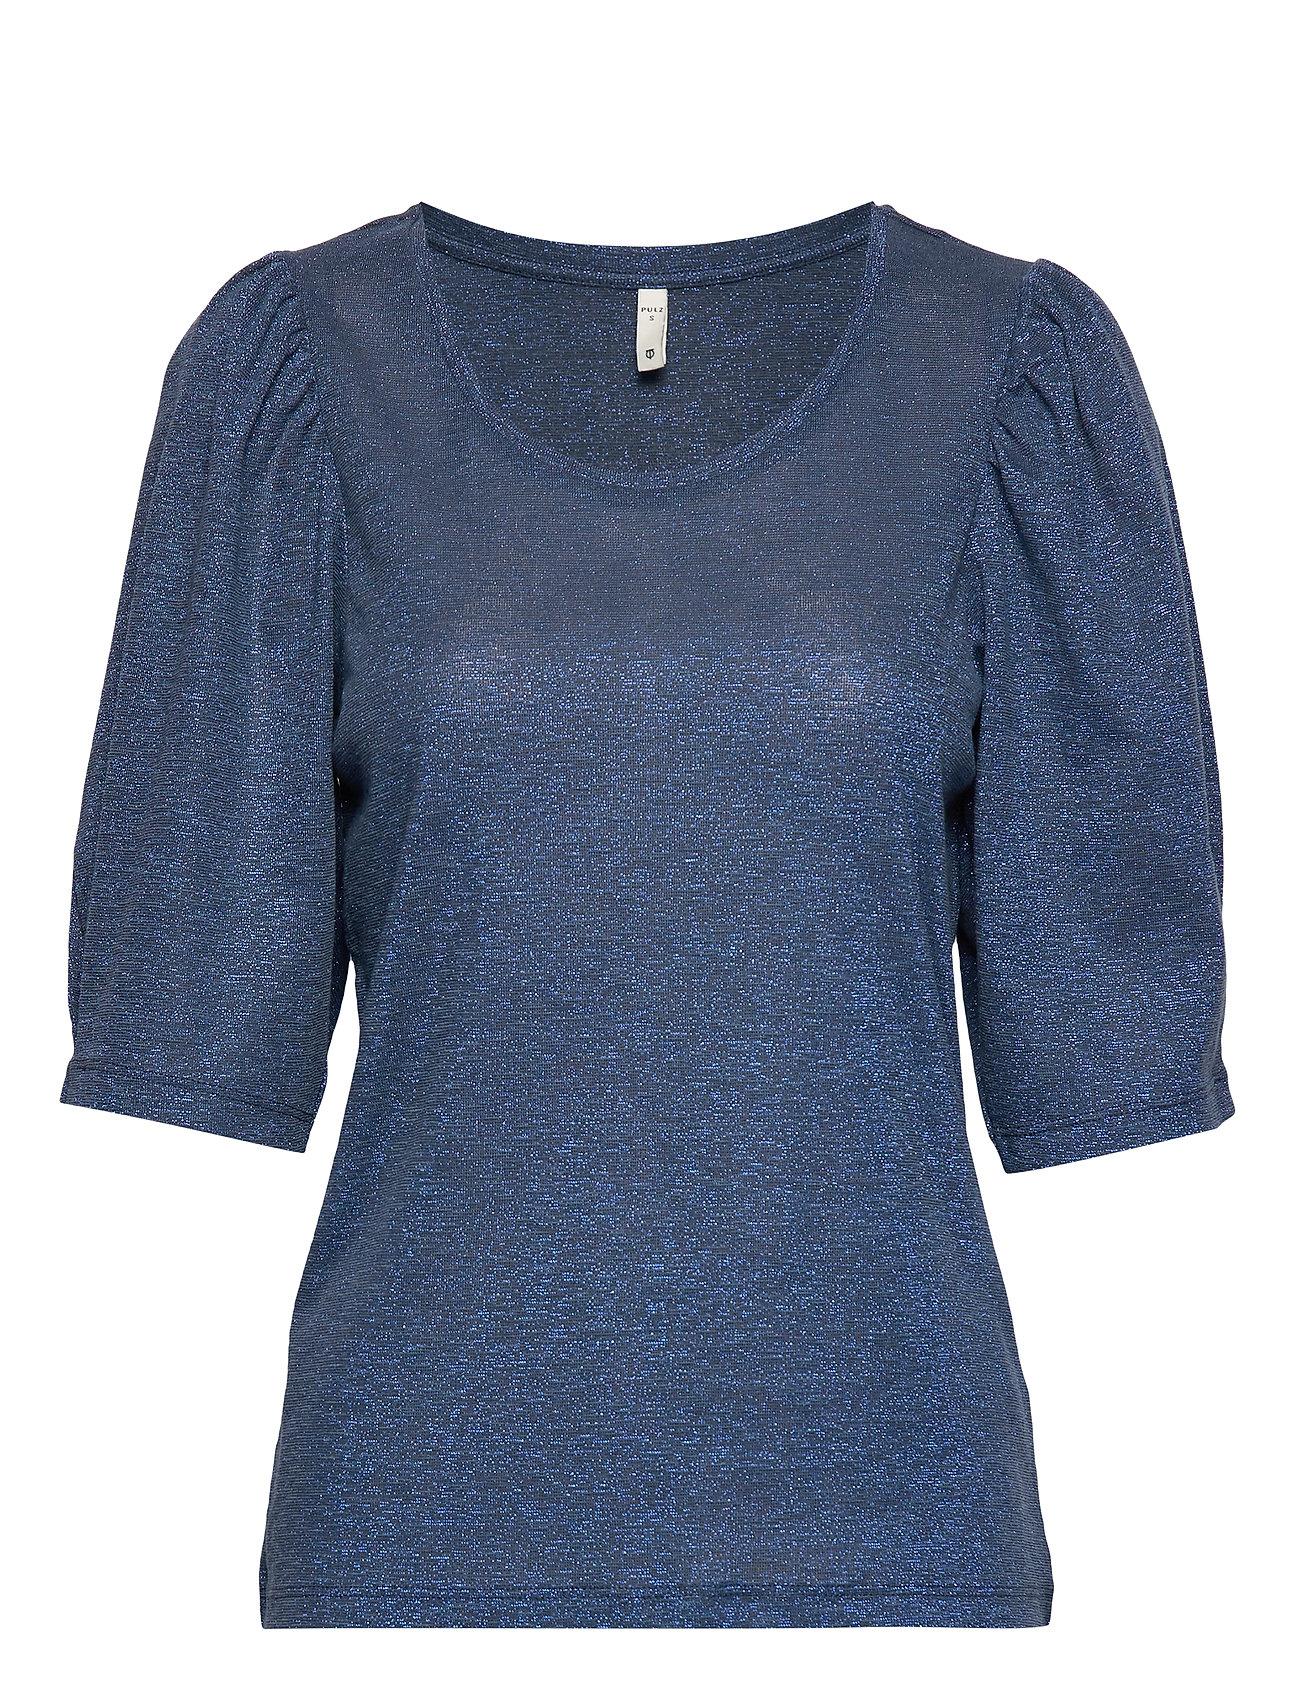 Pulz Jeans PZFRIDAY T-shirt - MIDNIGHT NAVY